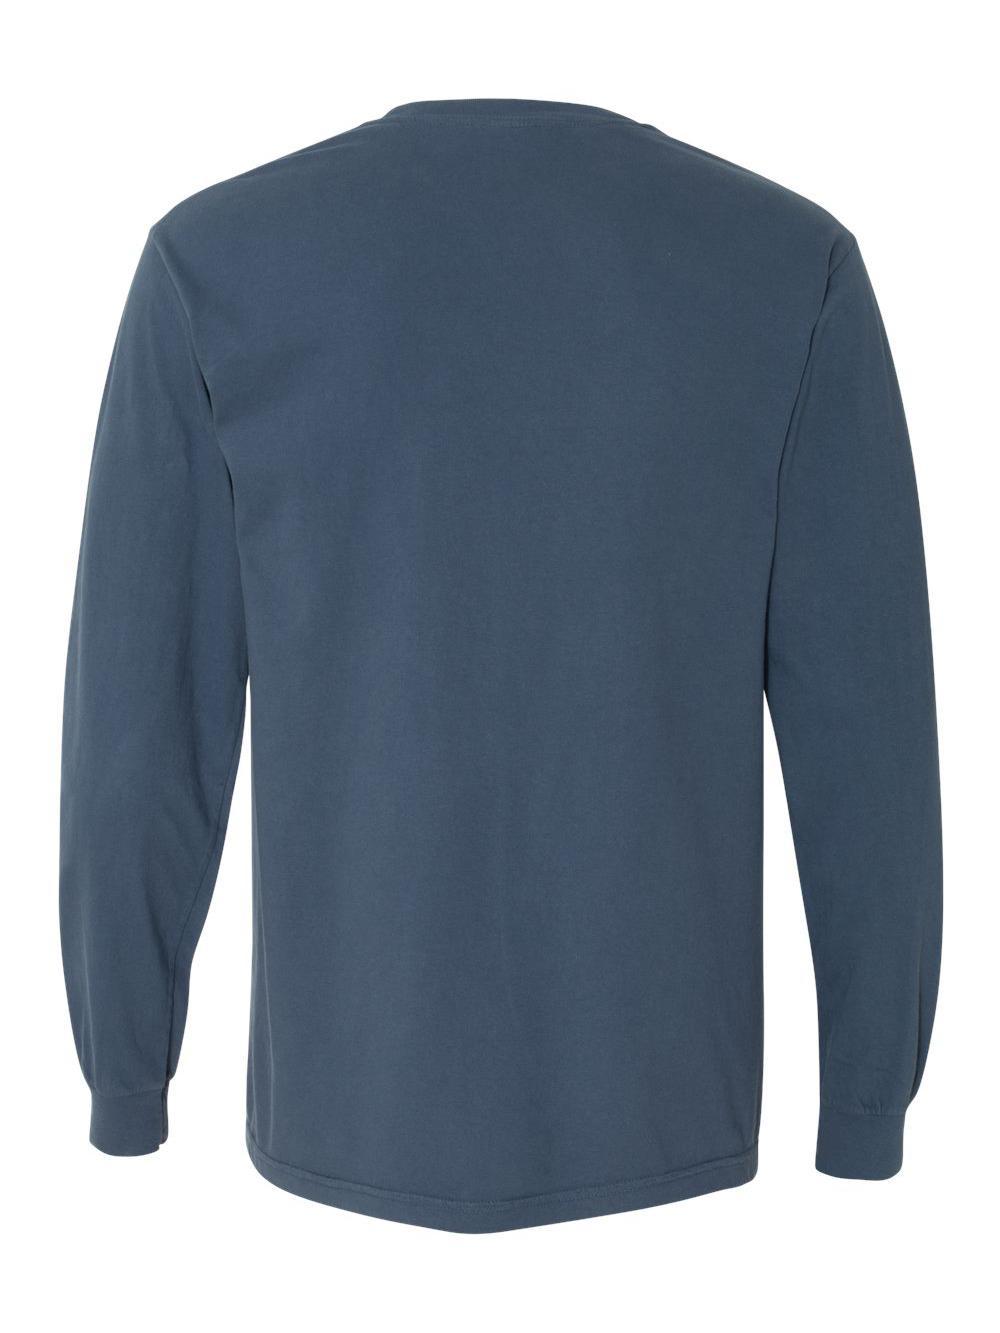 Comfort-Colors-Garment-Dyed-Heavyweight-Ringspun-Long-Sleeve-T-Shirt-6014 thumbnail 52